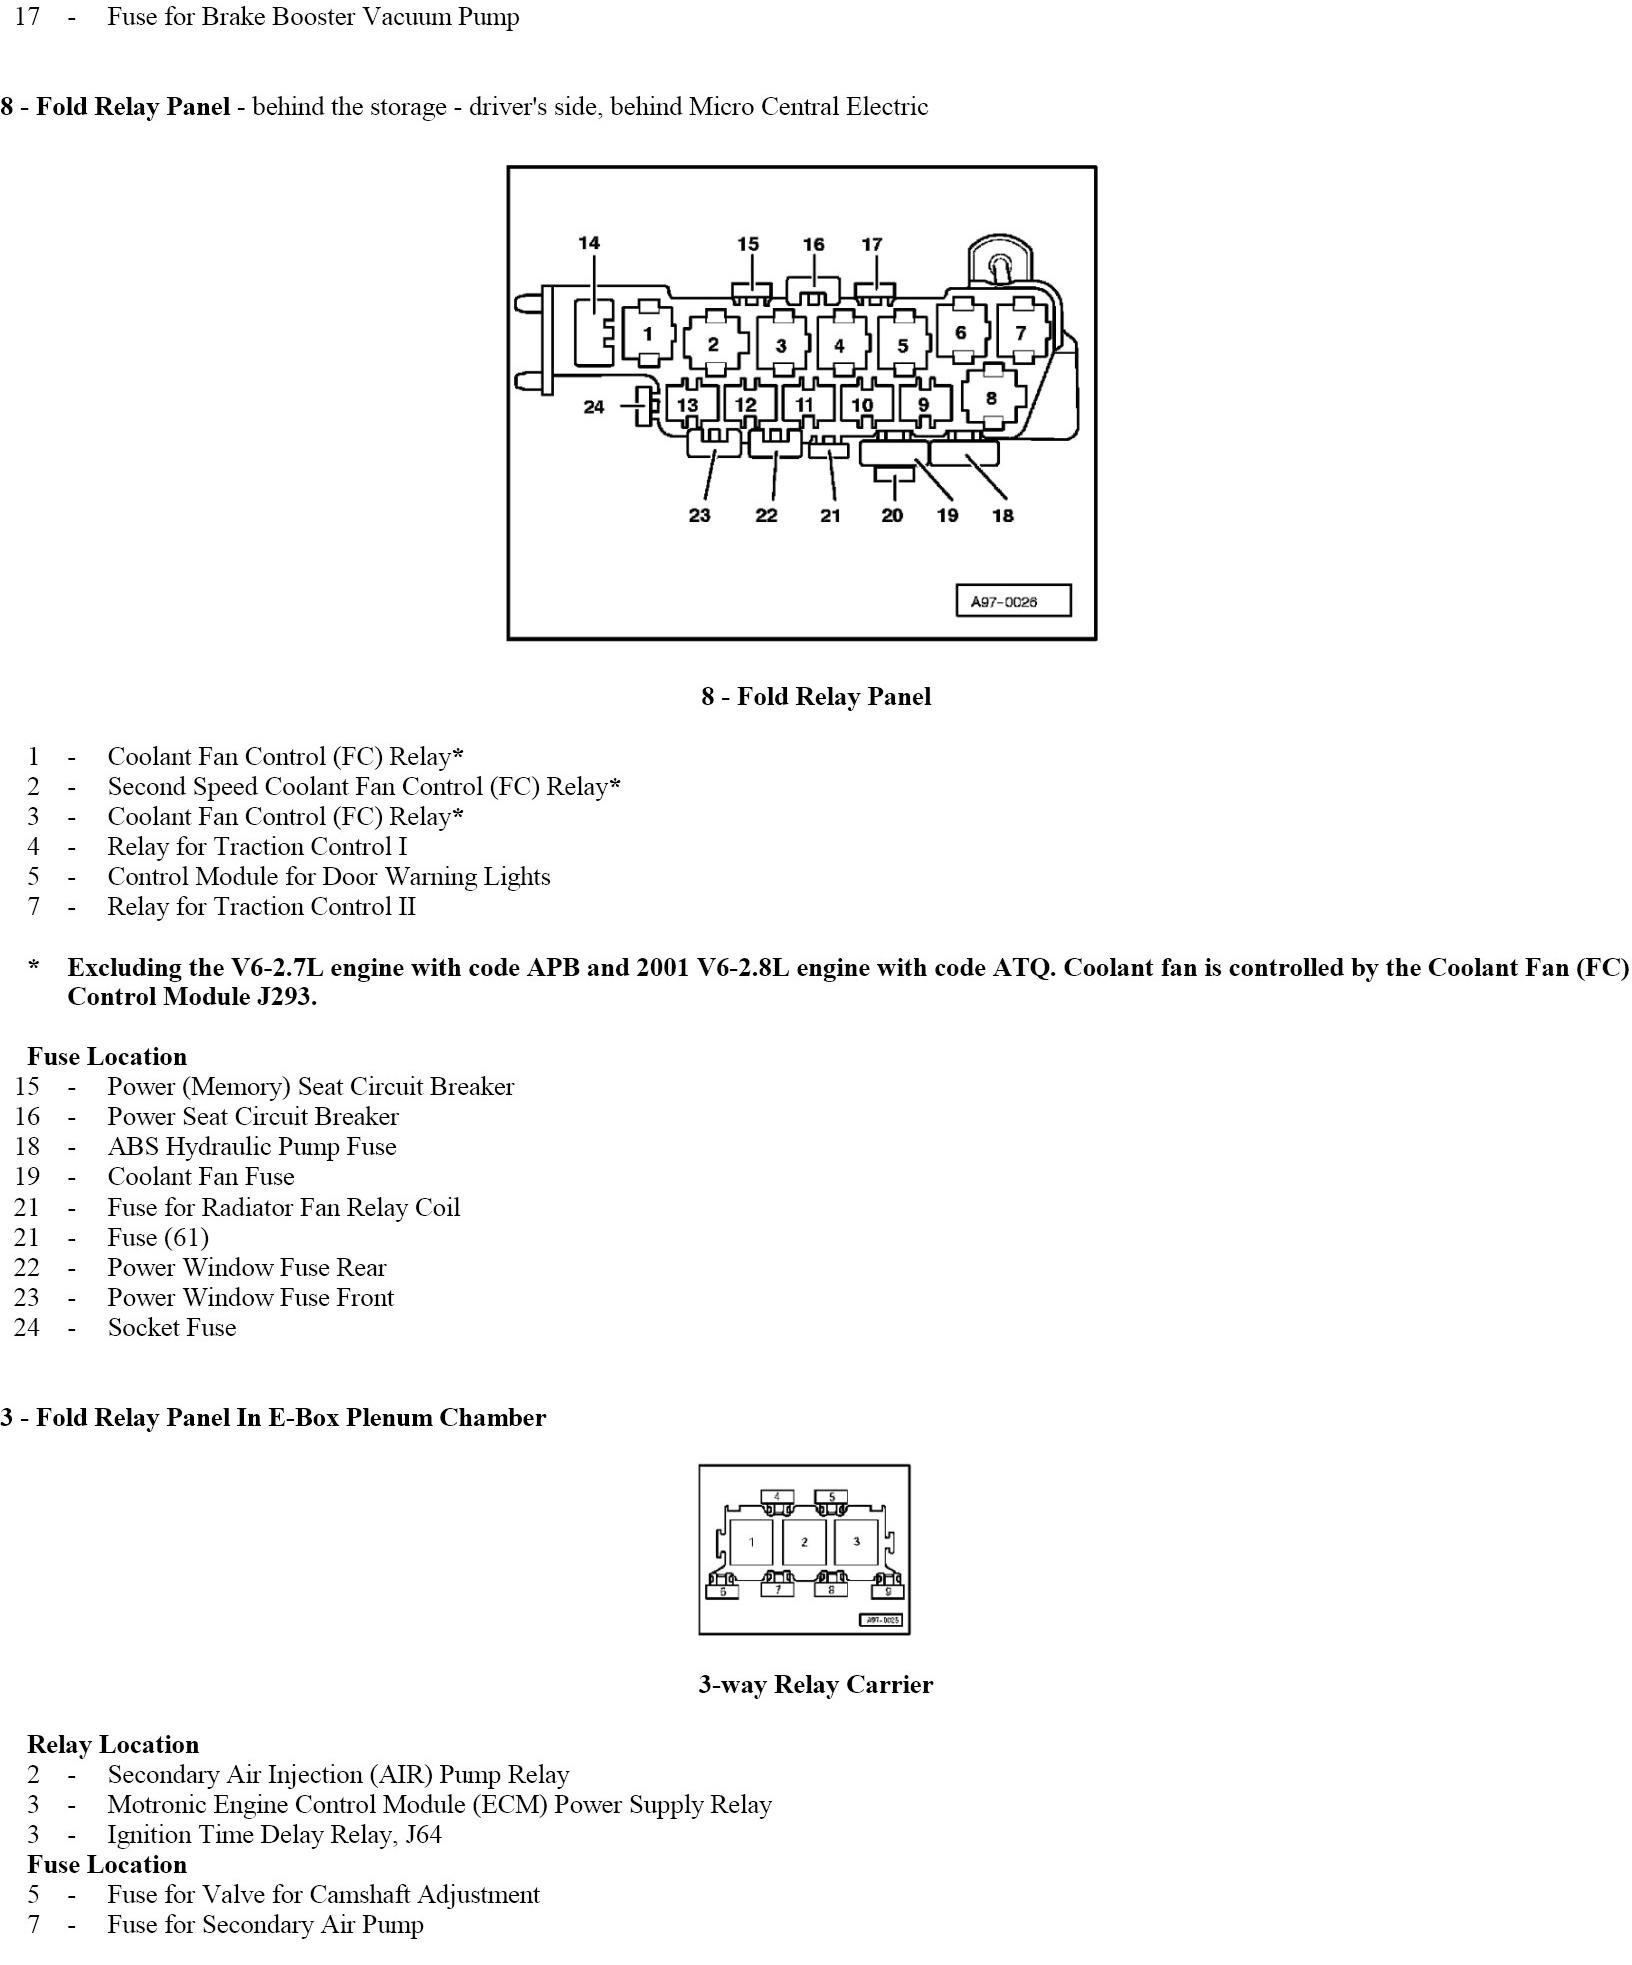 B5 S4 Fuse Diagram | Wiring Diagram B Engine Diagram on audi rs4 engine, 2.7t engine, mazda 323 engine, 1.8t engine, b7 engine, b-series engine,